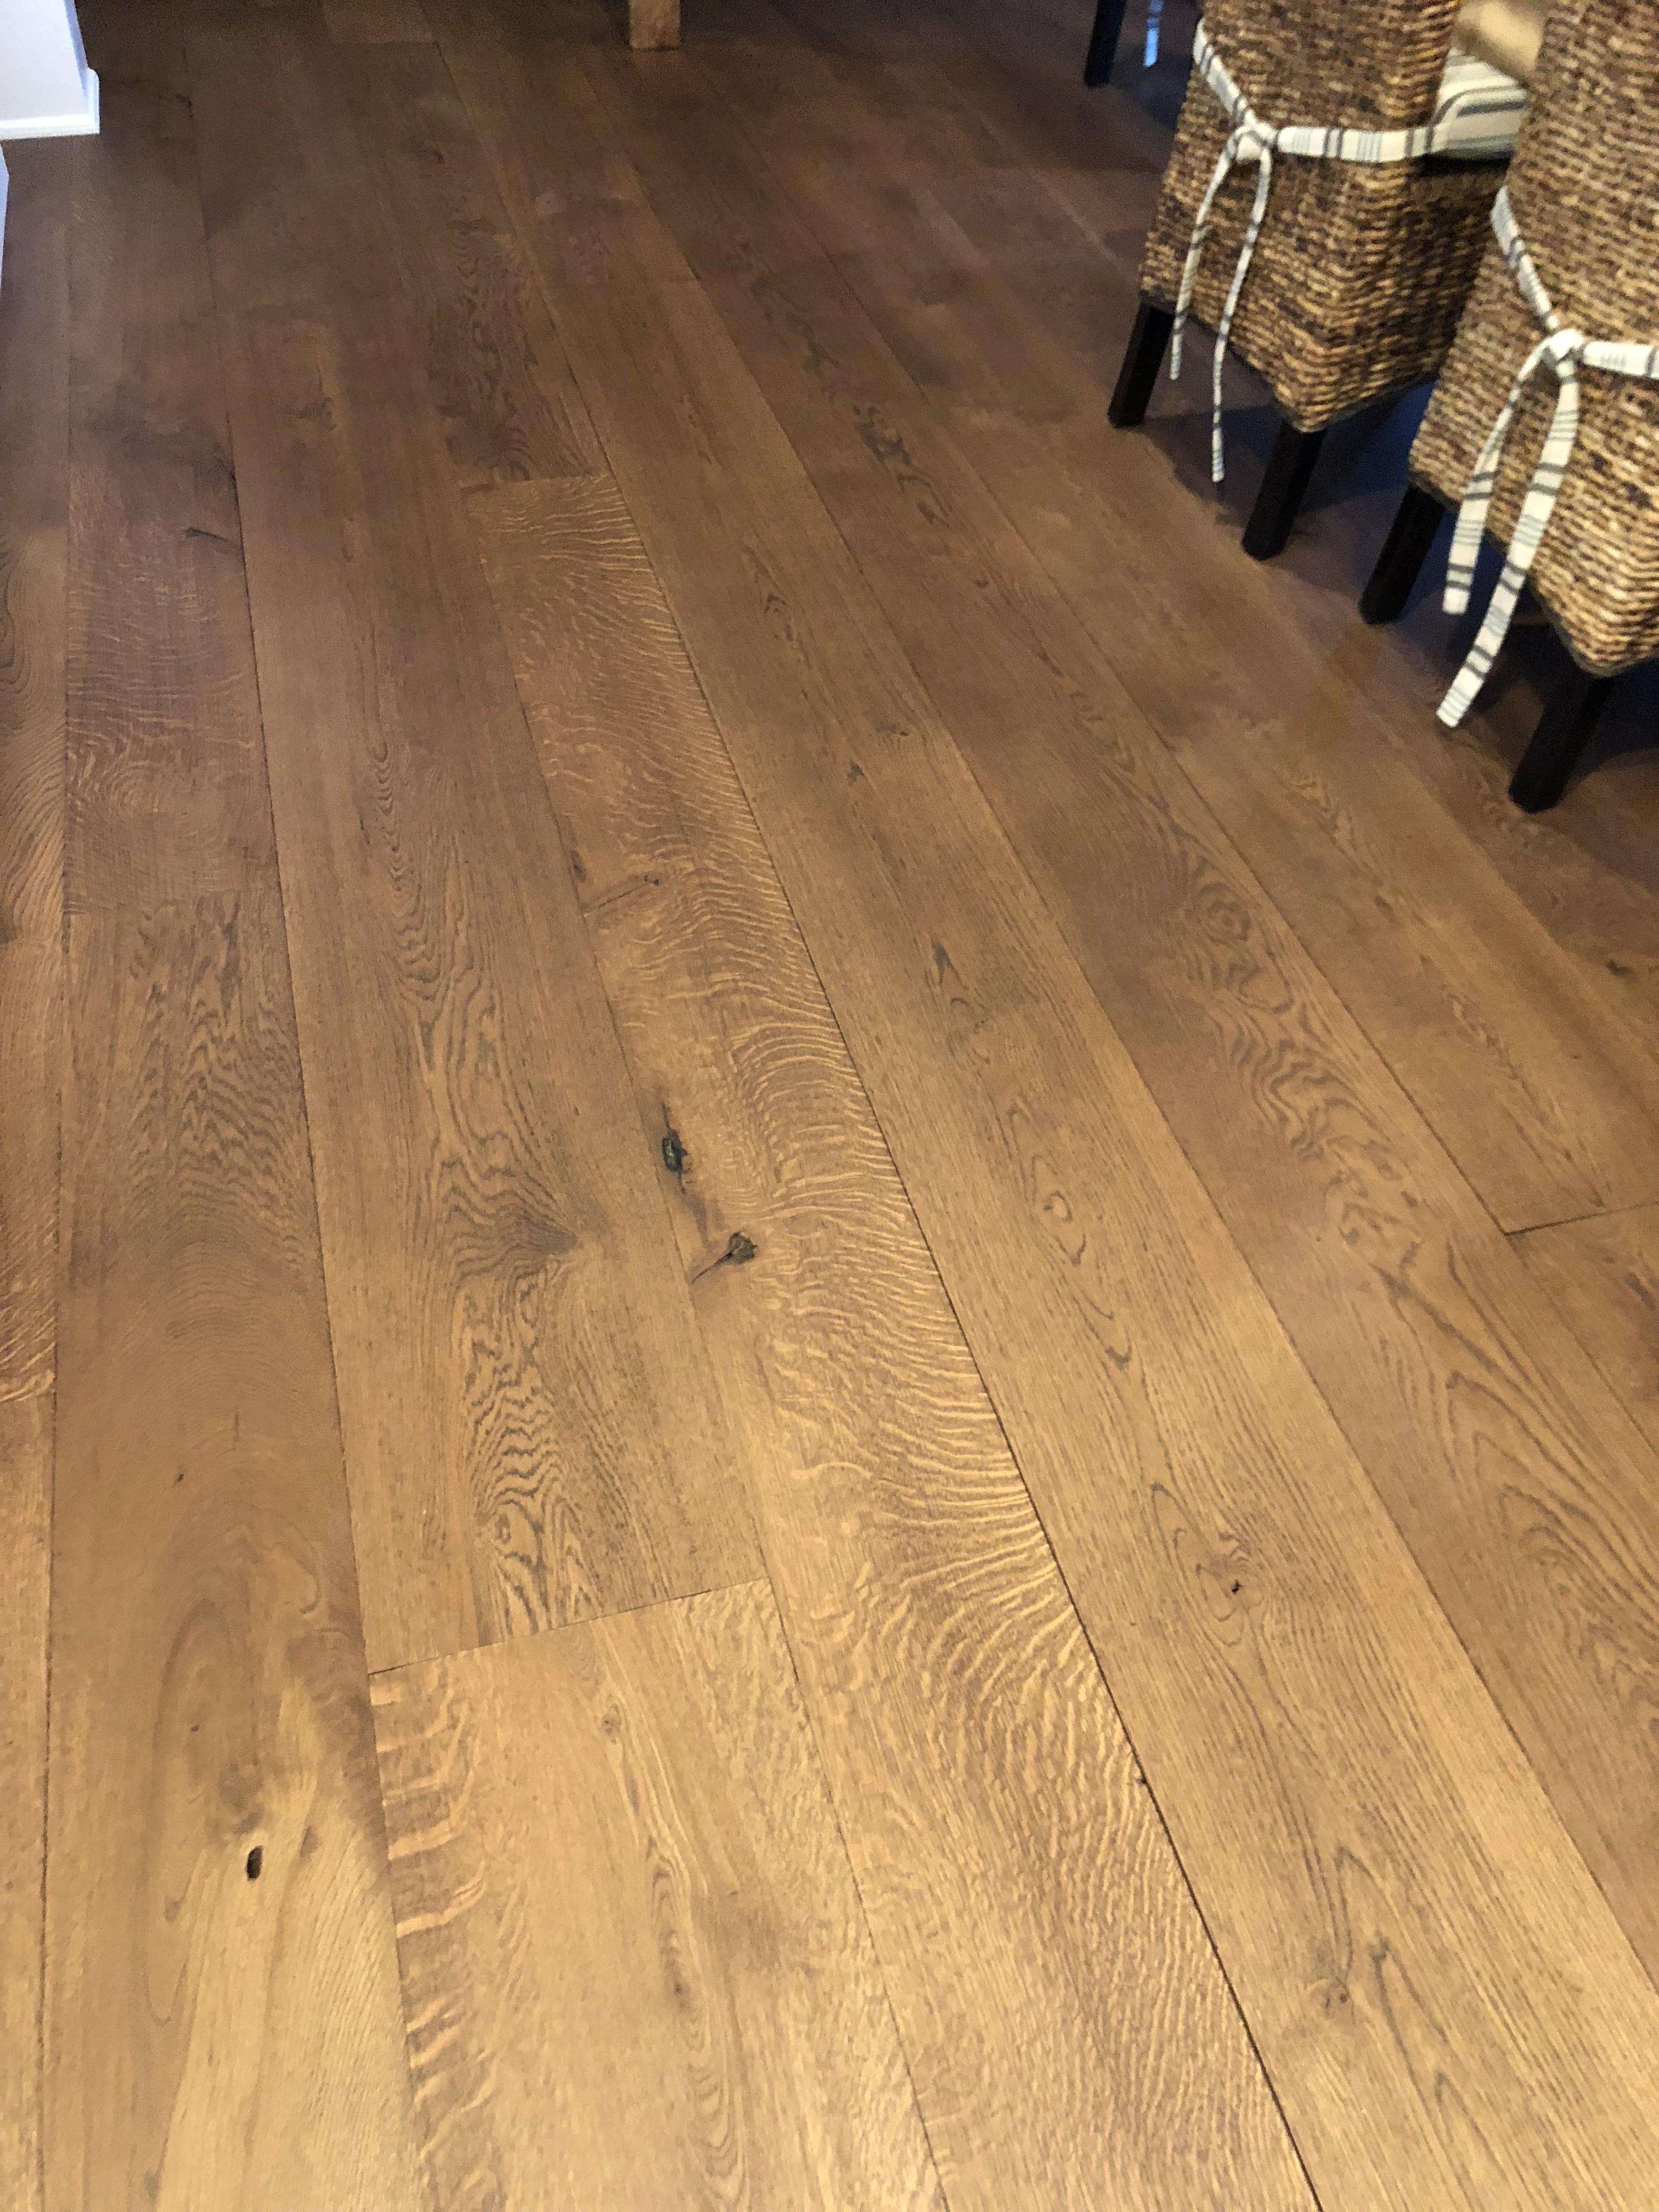 Quartered White Oak Rustic Grade Wide Plank Flooring